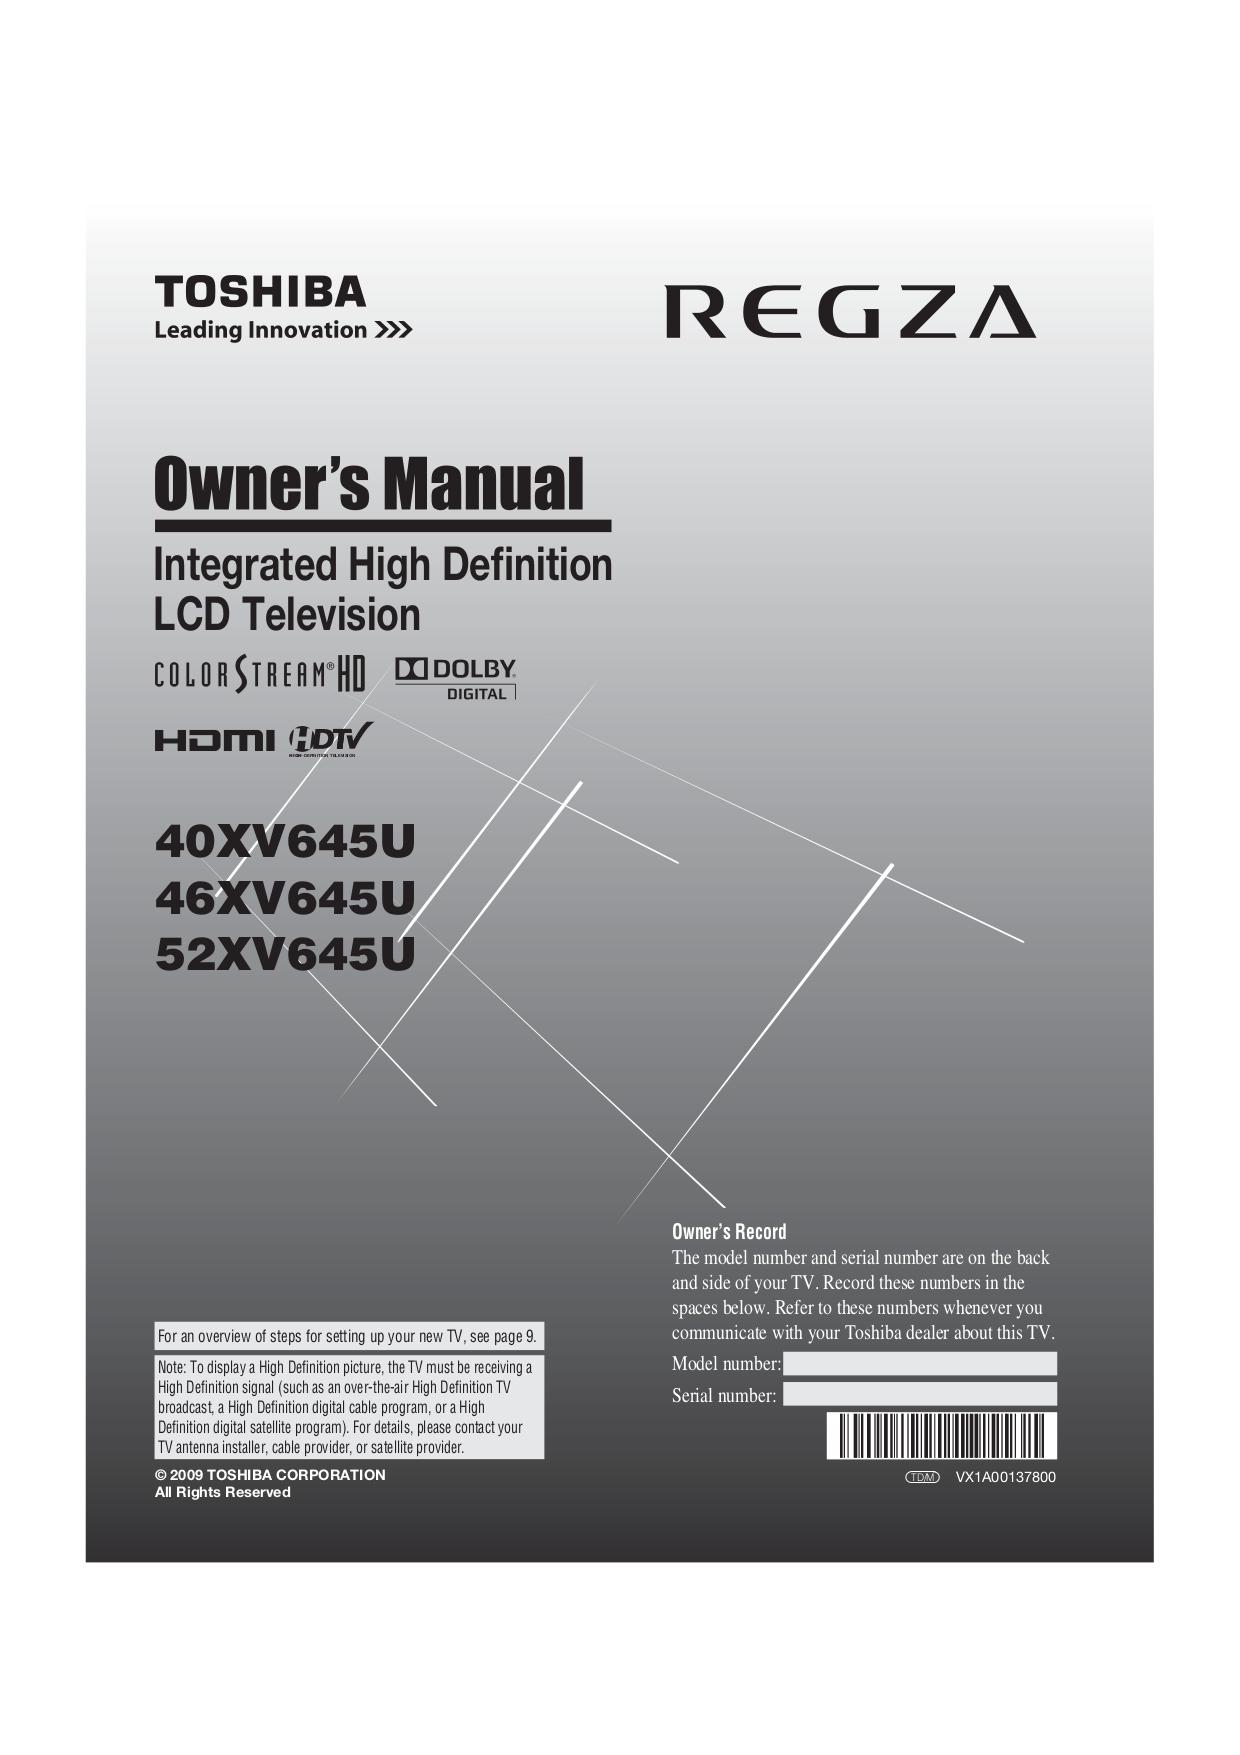 download free pdf for toshiba regza 52xv645u tv manual rh umlib com Toshiba TV Manual Online Toshiba Flat Screen TV Manual